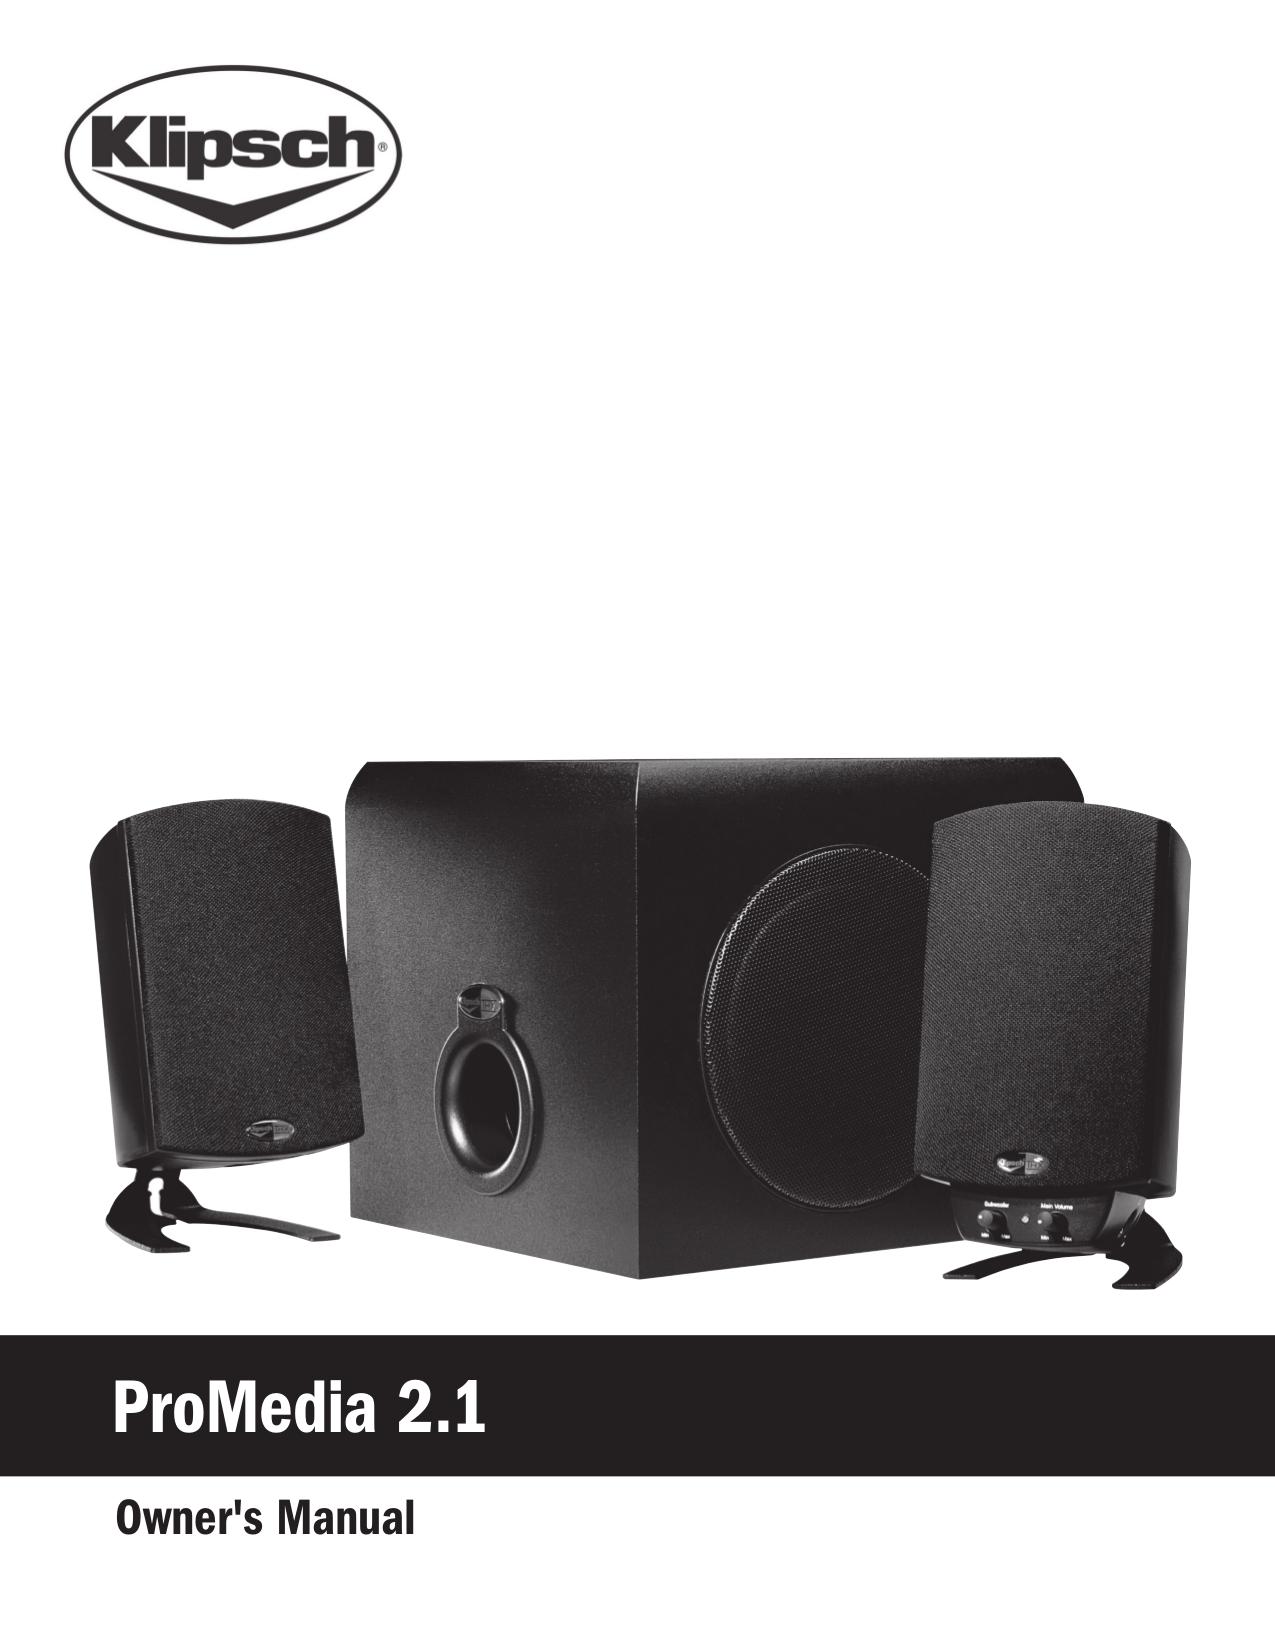 download free pdf for klipsch promedia promedia 2 1 speaker manual Klipsch ProMedia 4.1 Subwoofer Repair Klipsch Sub 10 Manual